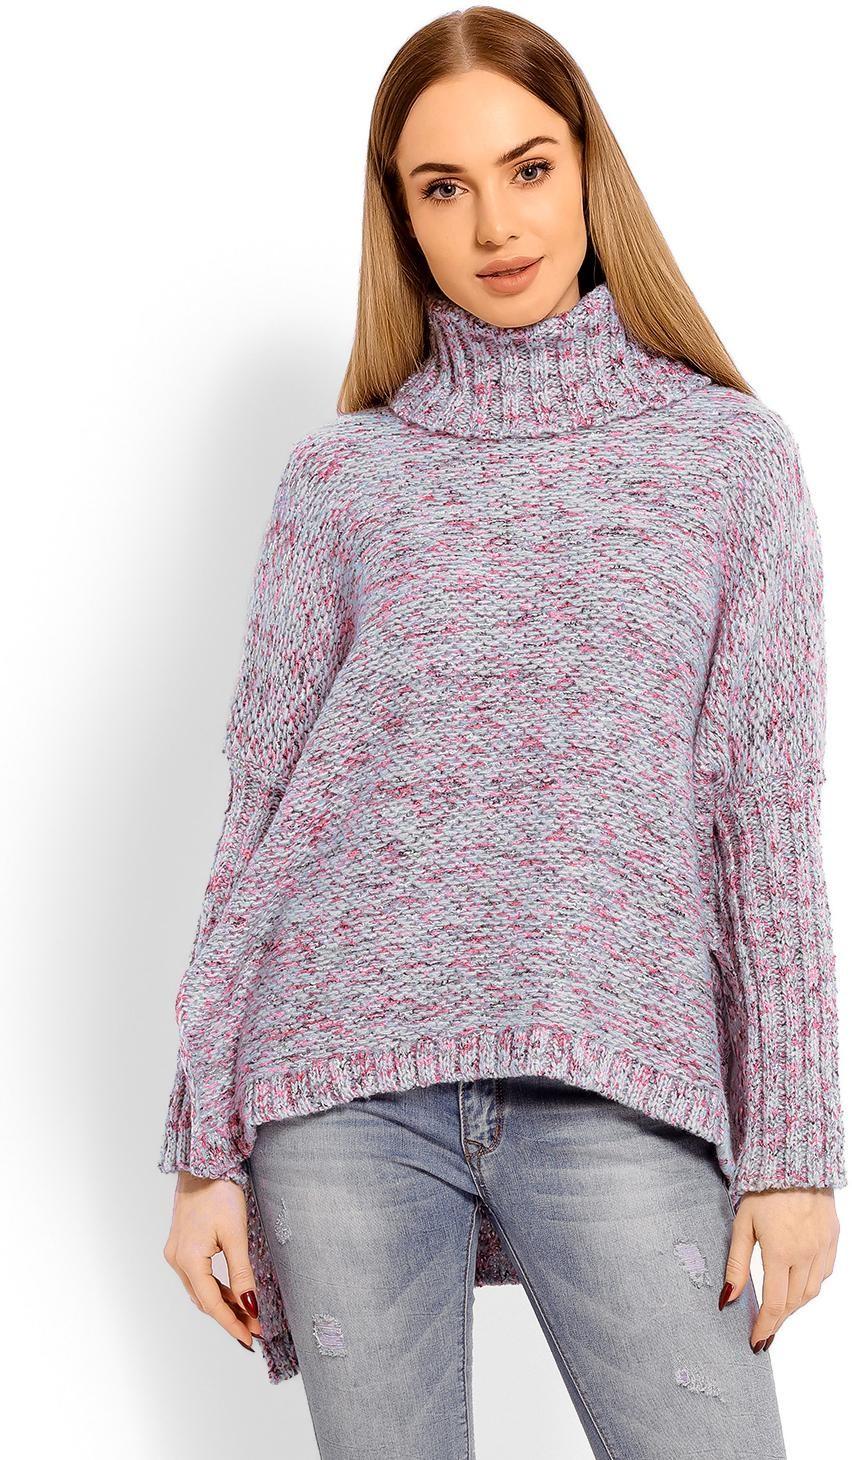 Dámsky sveter s rolákom 60002 - modrý - Uni